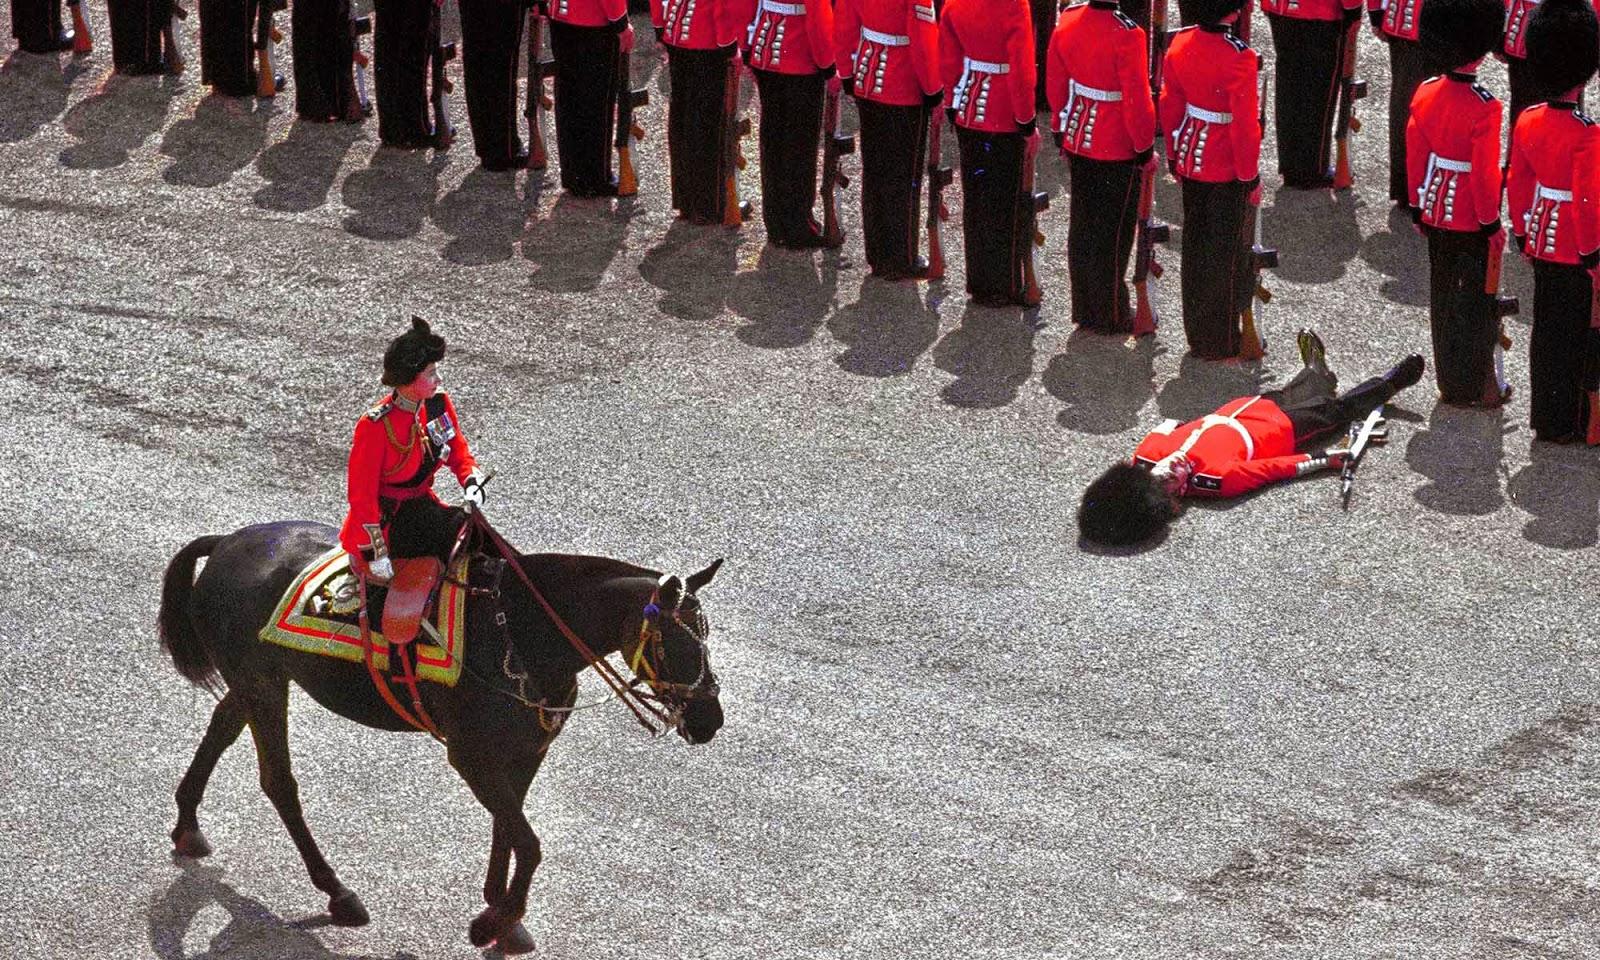 Почётный караул падаетв обморок, когдакоролева Елизавета II едет мимо, 1970